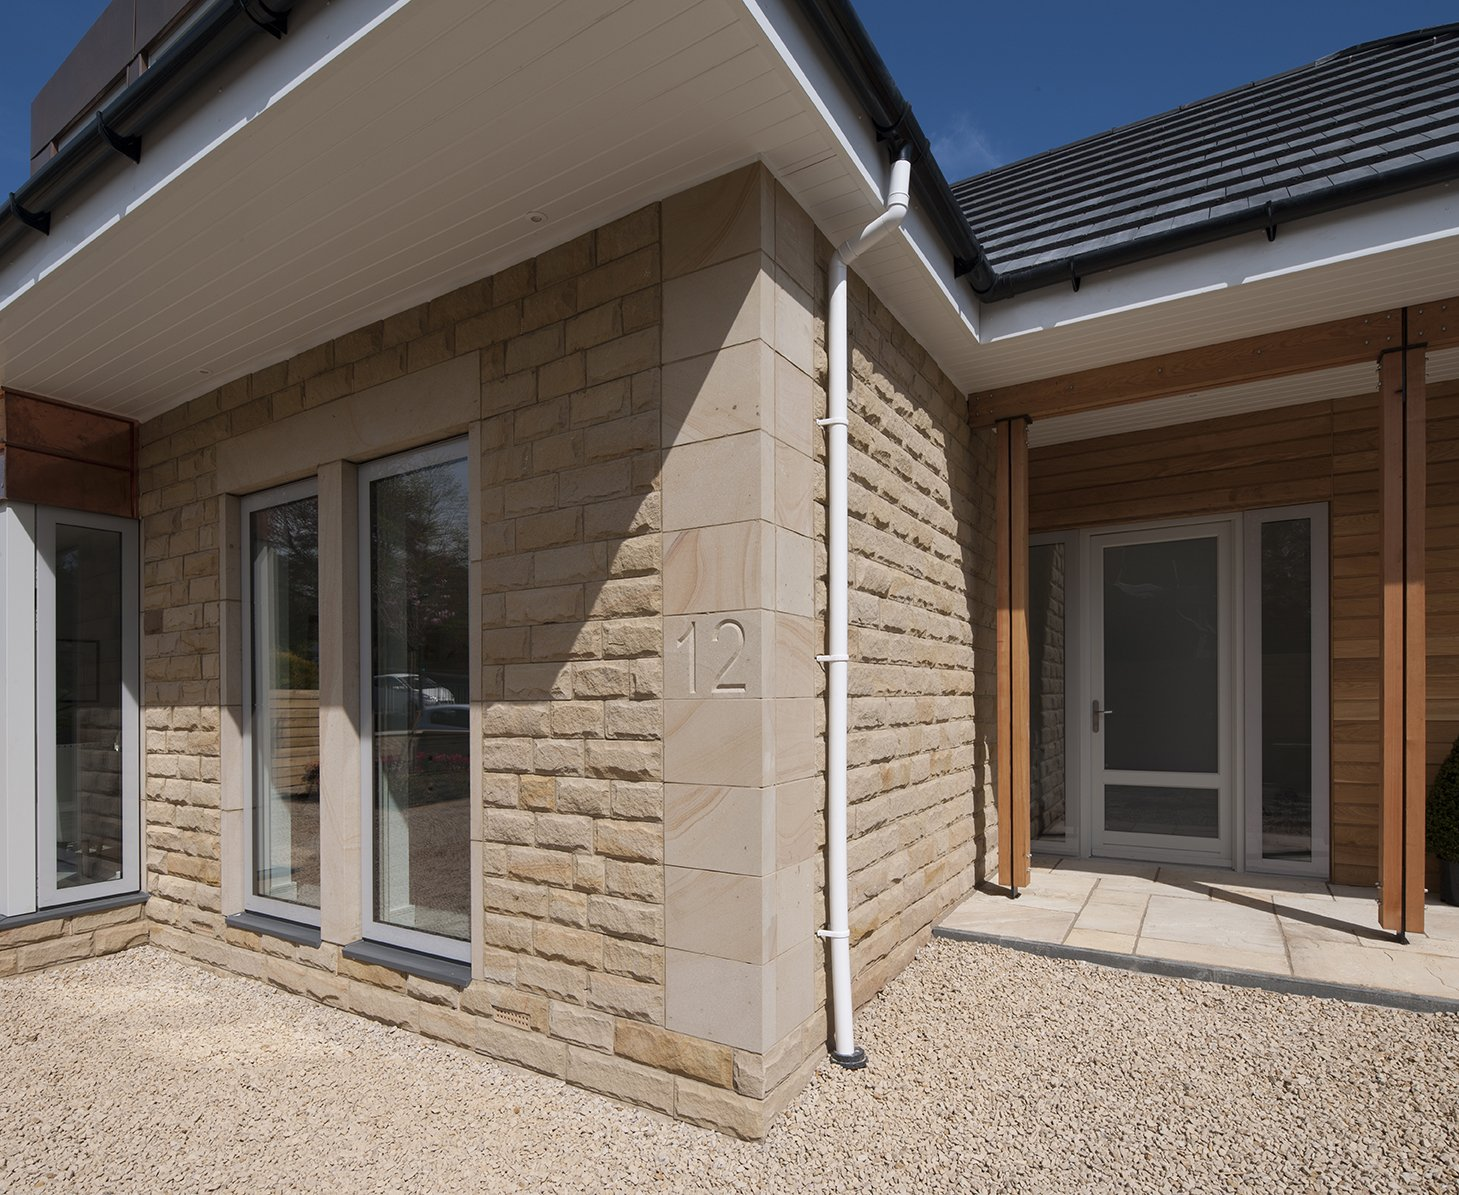 Longridge Sandstone Walling and Sandstone Quoins by Cumbrian Stone